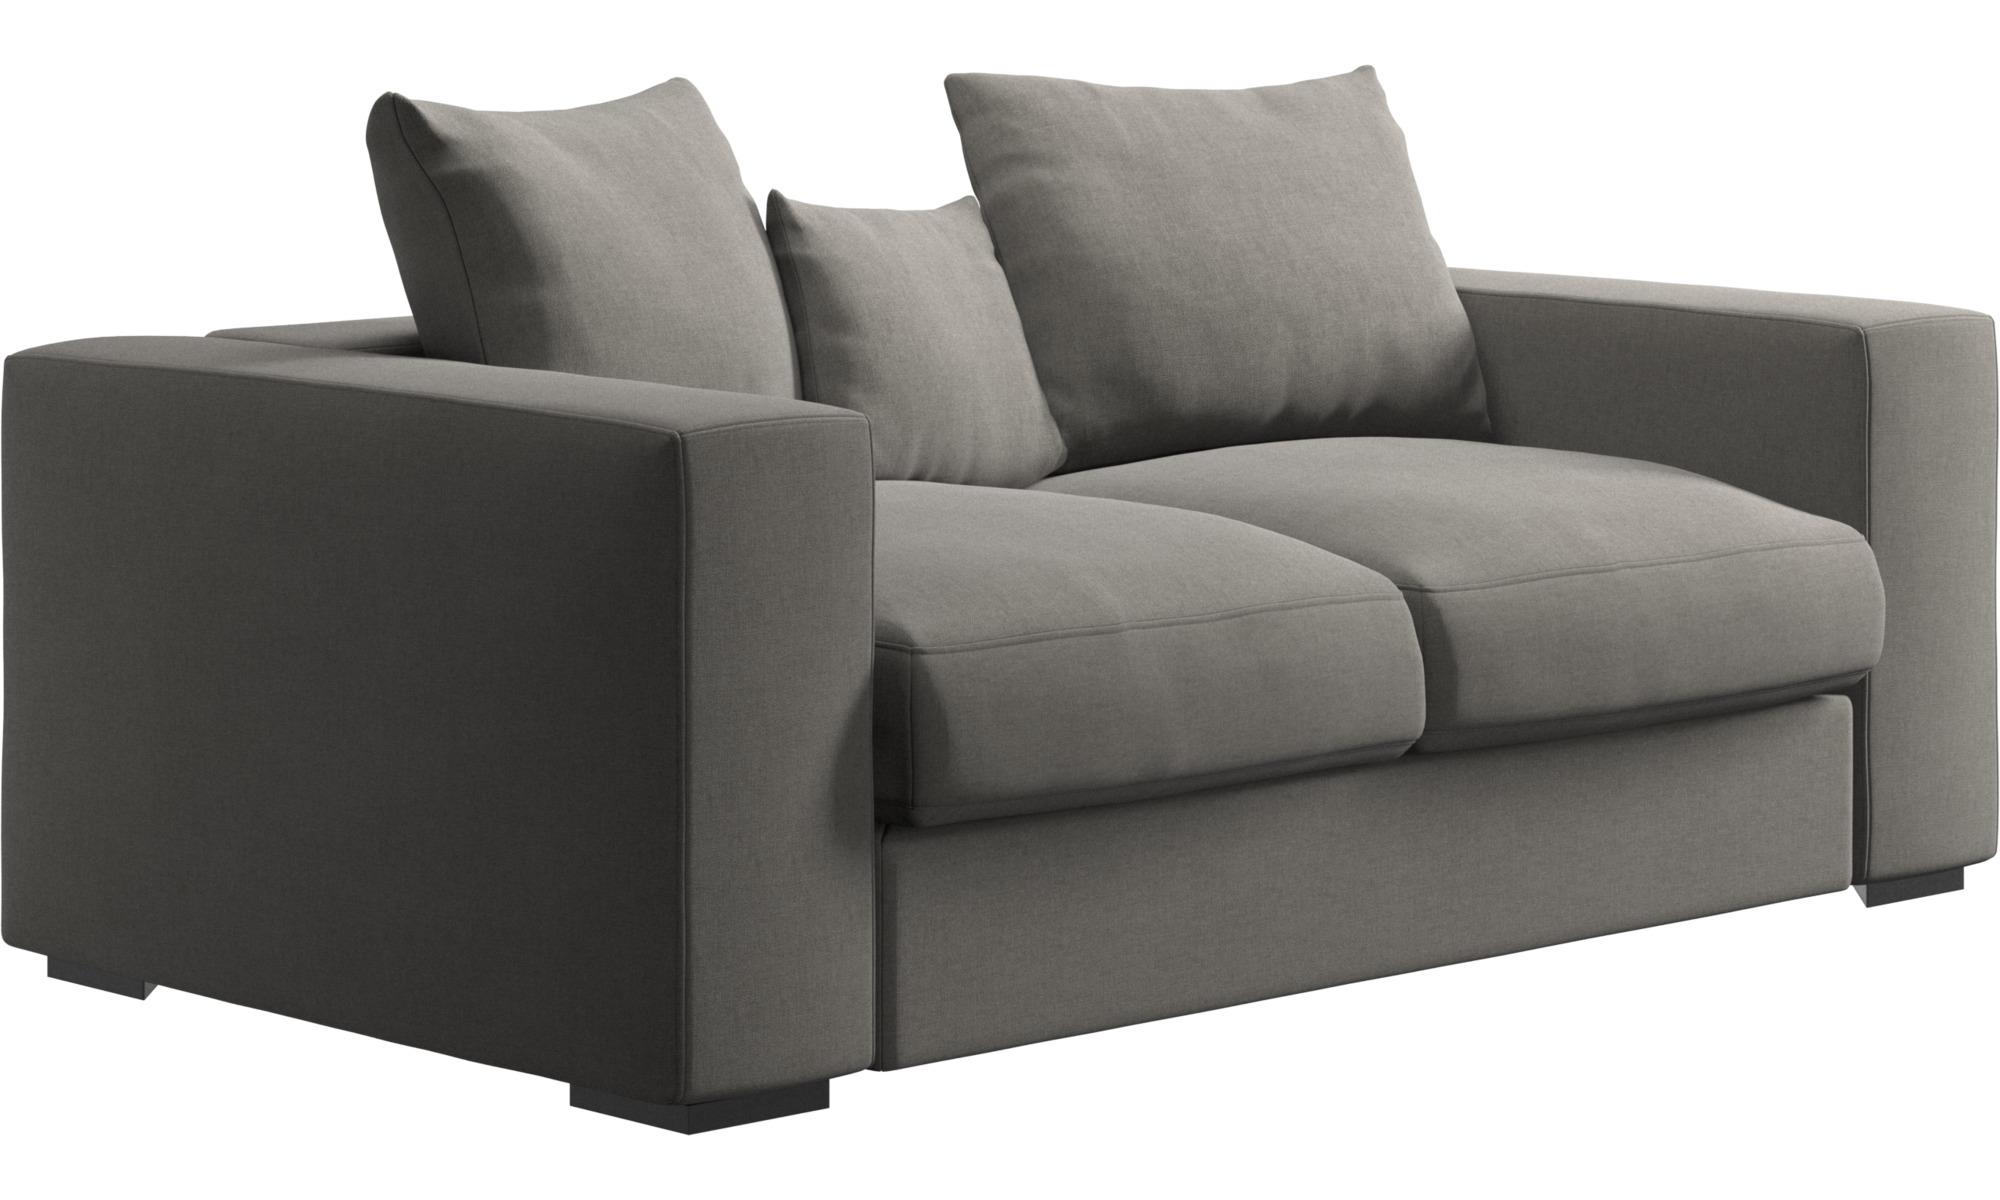 canap s 2 places canap cenova boconcept. Black Bedroom Furniture Sets. Home Design Ideas